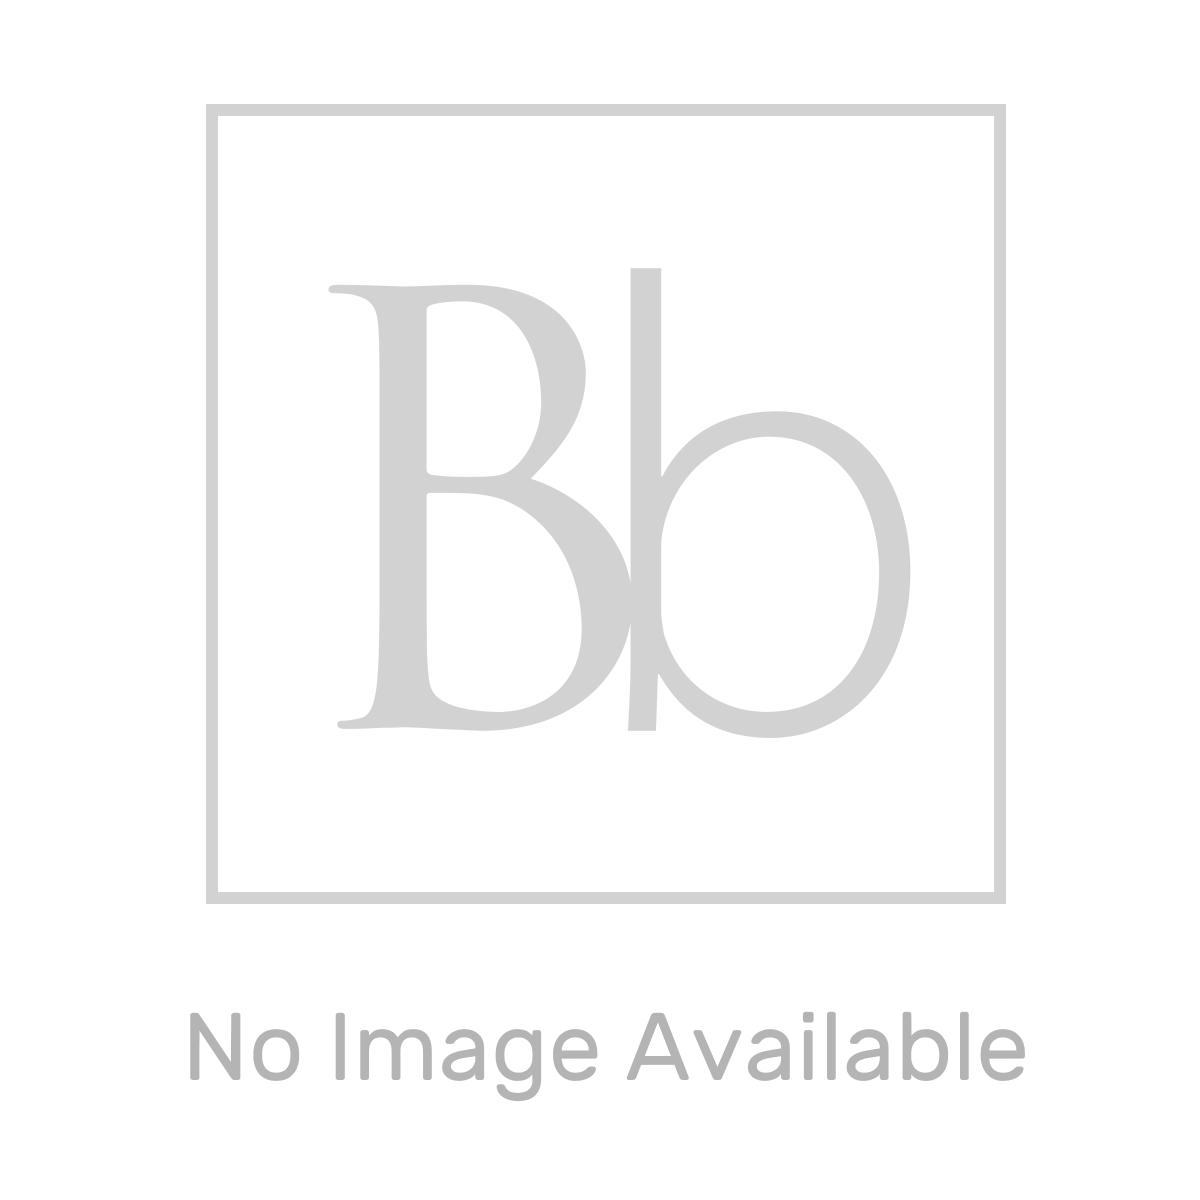 RAK Washington White Bathroom Mirror 650mm Measurements